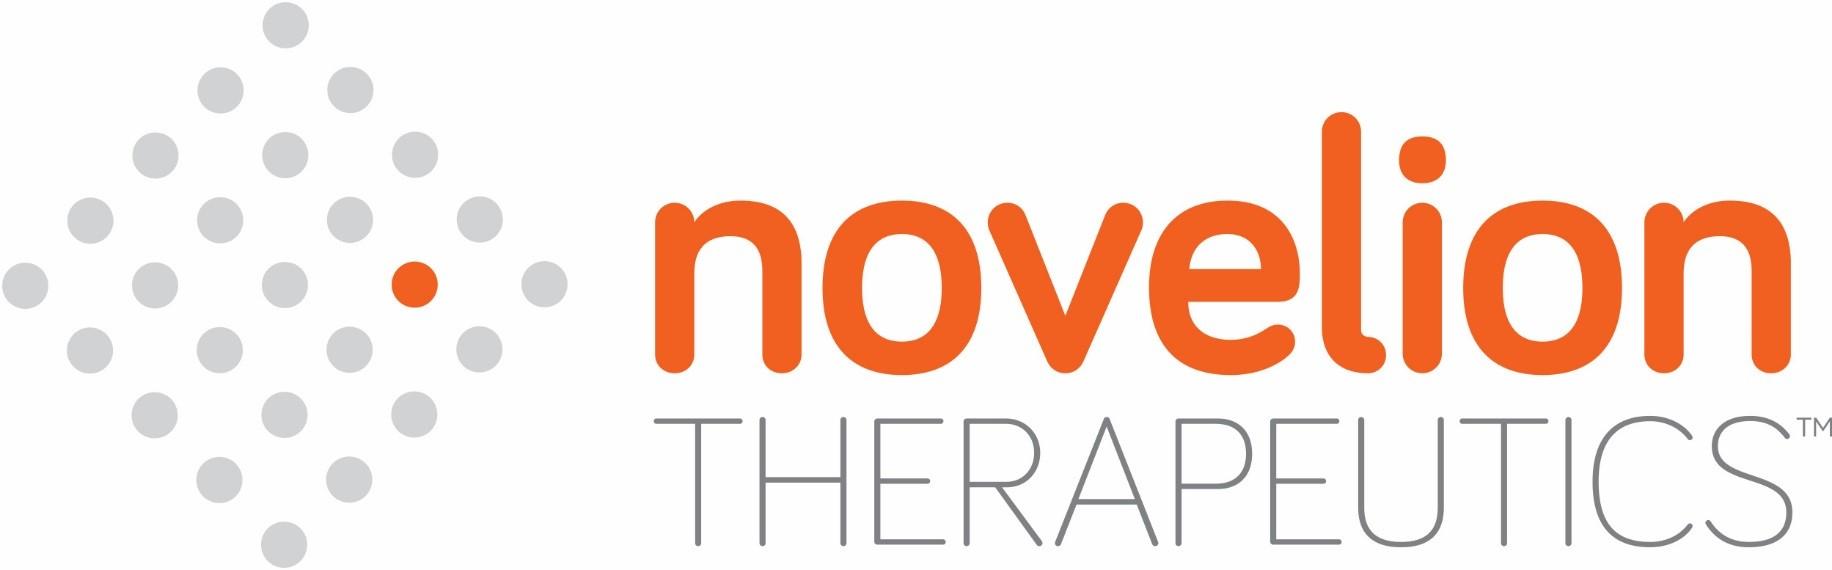 Novelion Therapeutics Announces Nasdaq Delisting